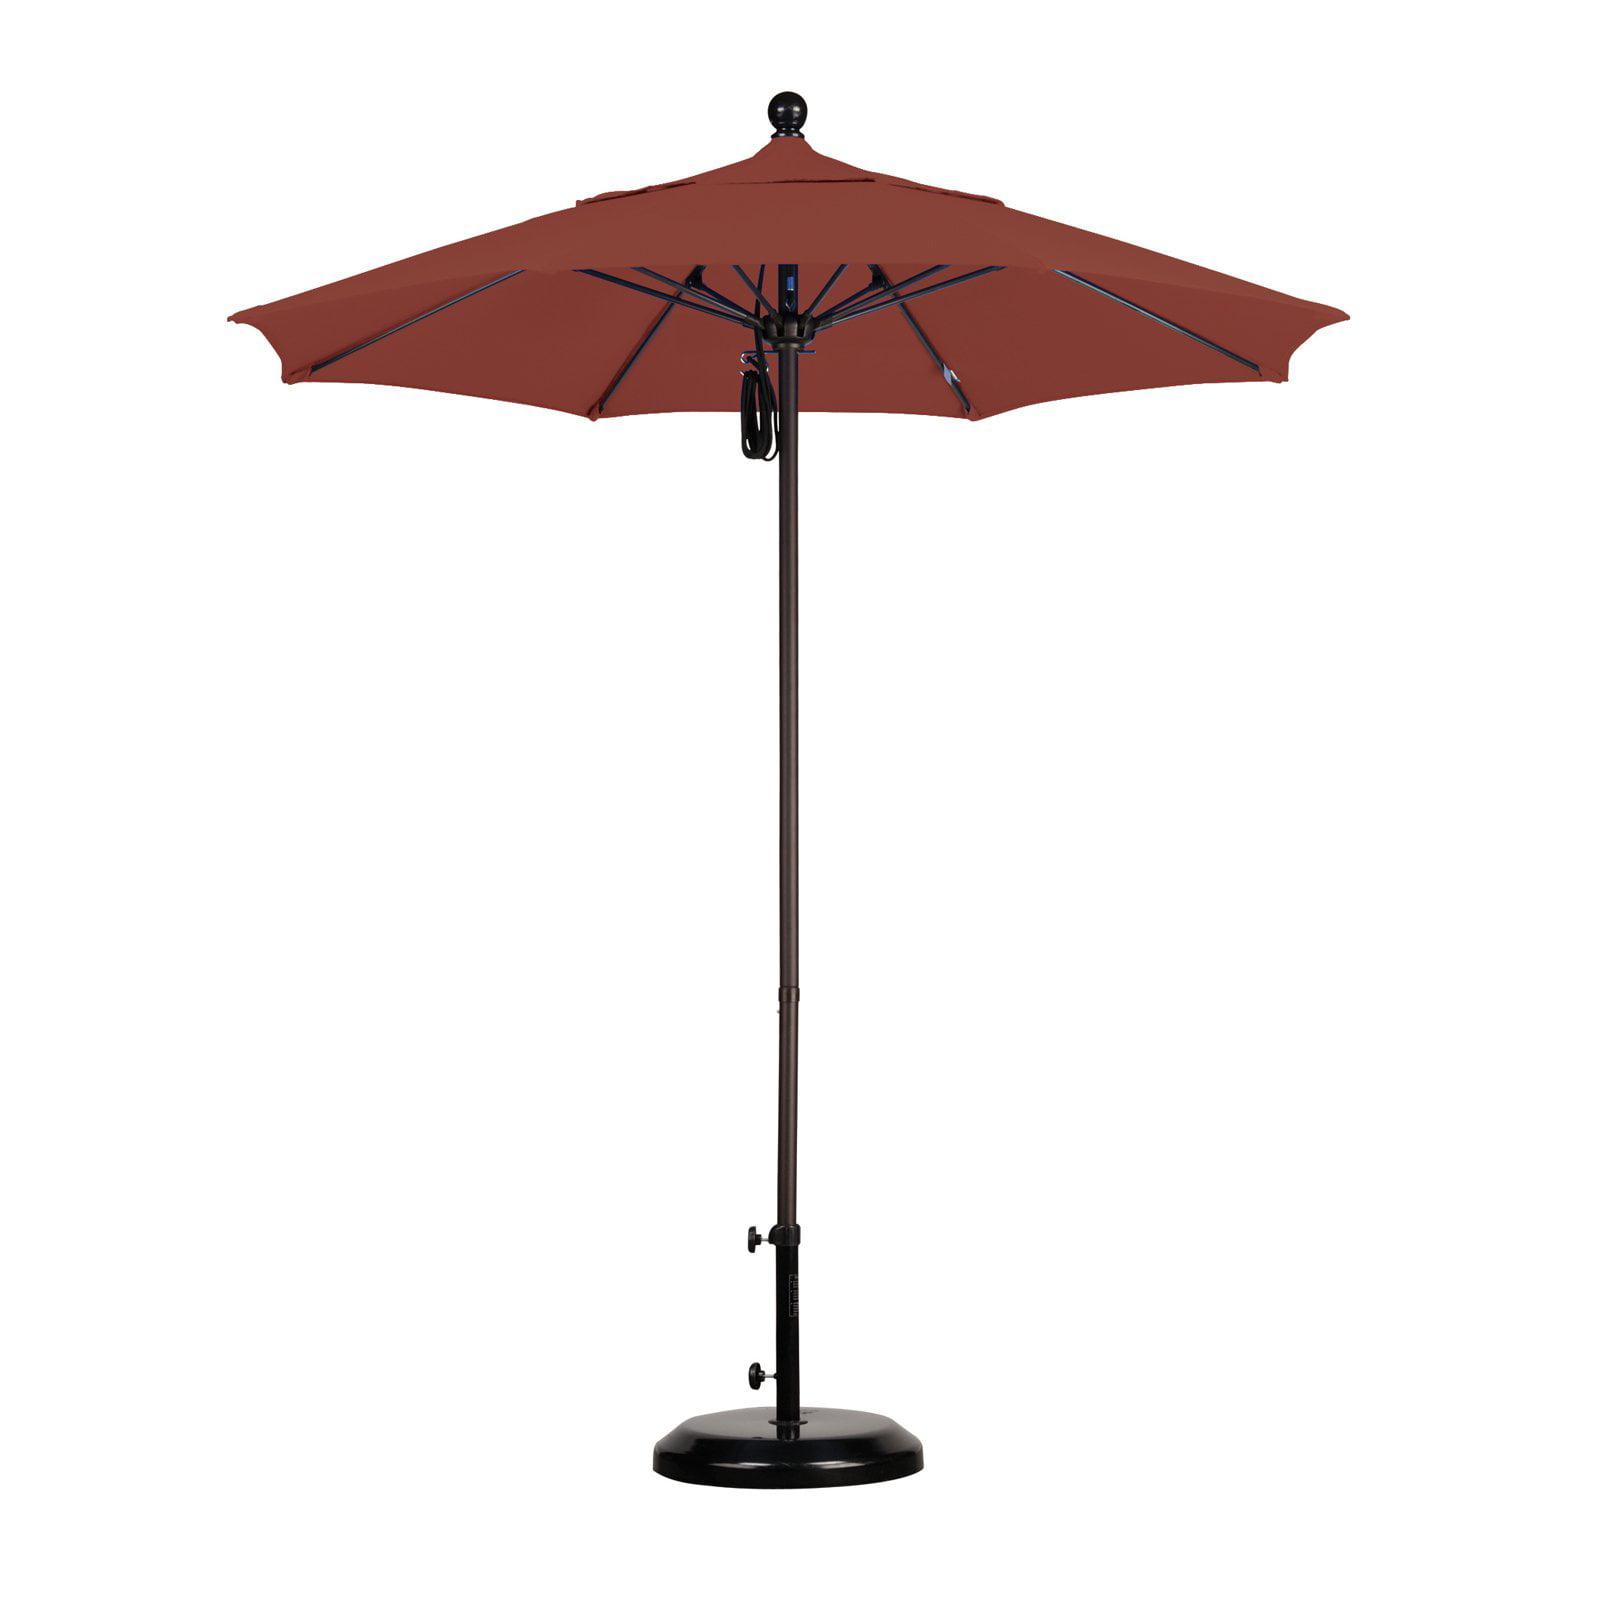 7.5' Fiberglass Market Umbrella PO DVent Bronze/Sunbrella/BayBrown